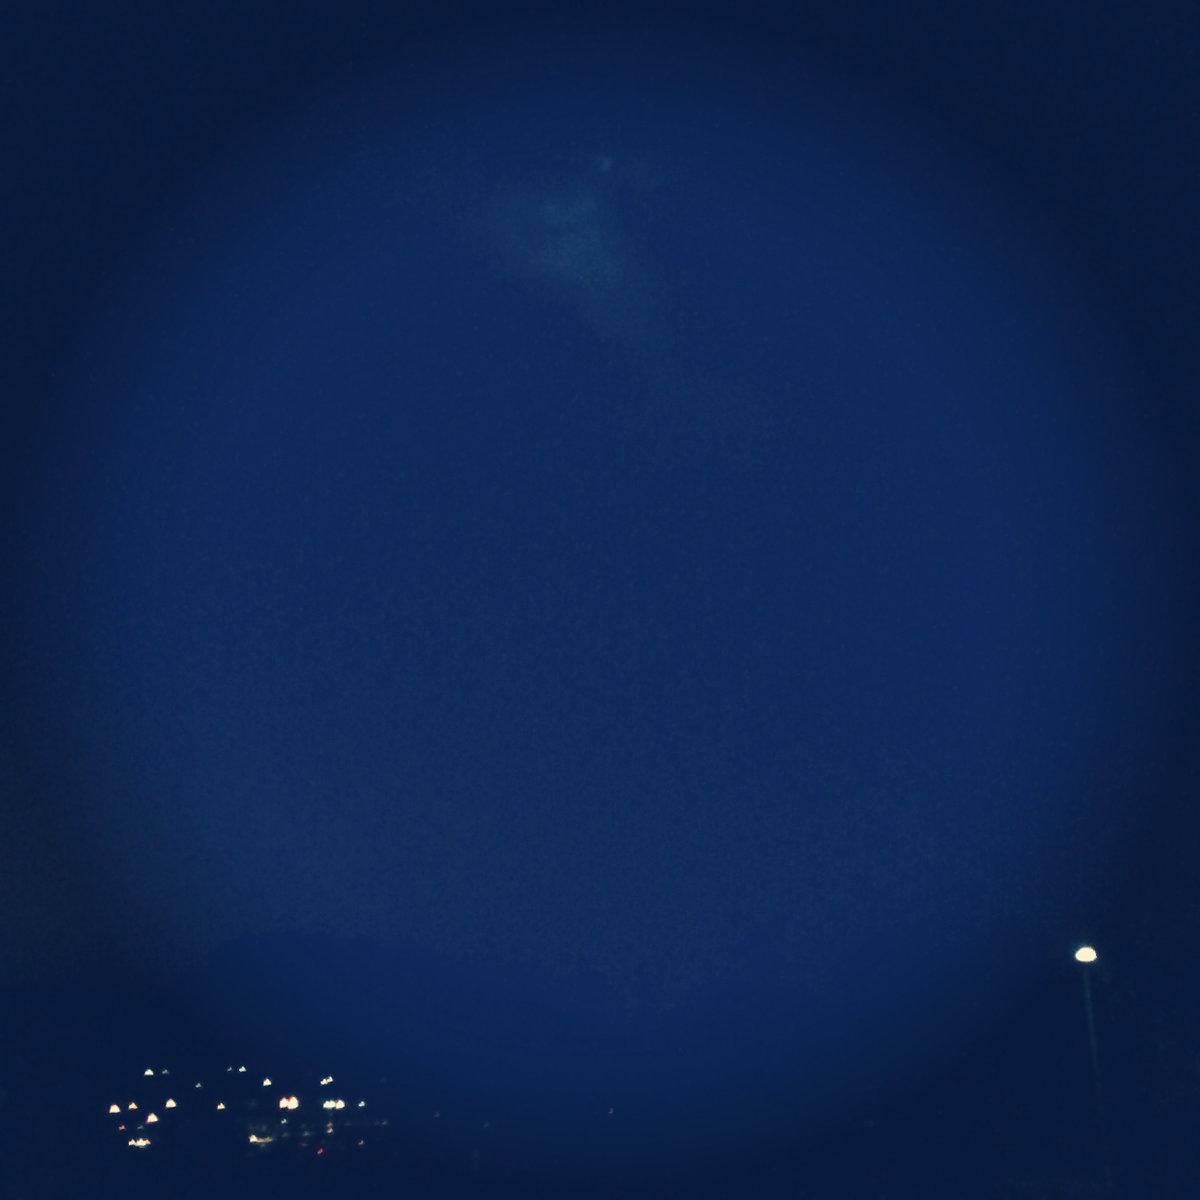 lemez17_galaxisok.jpg